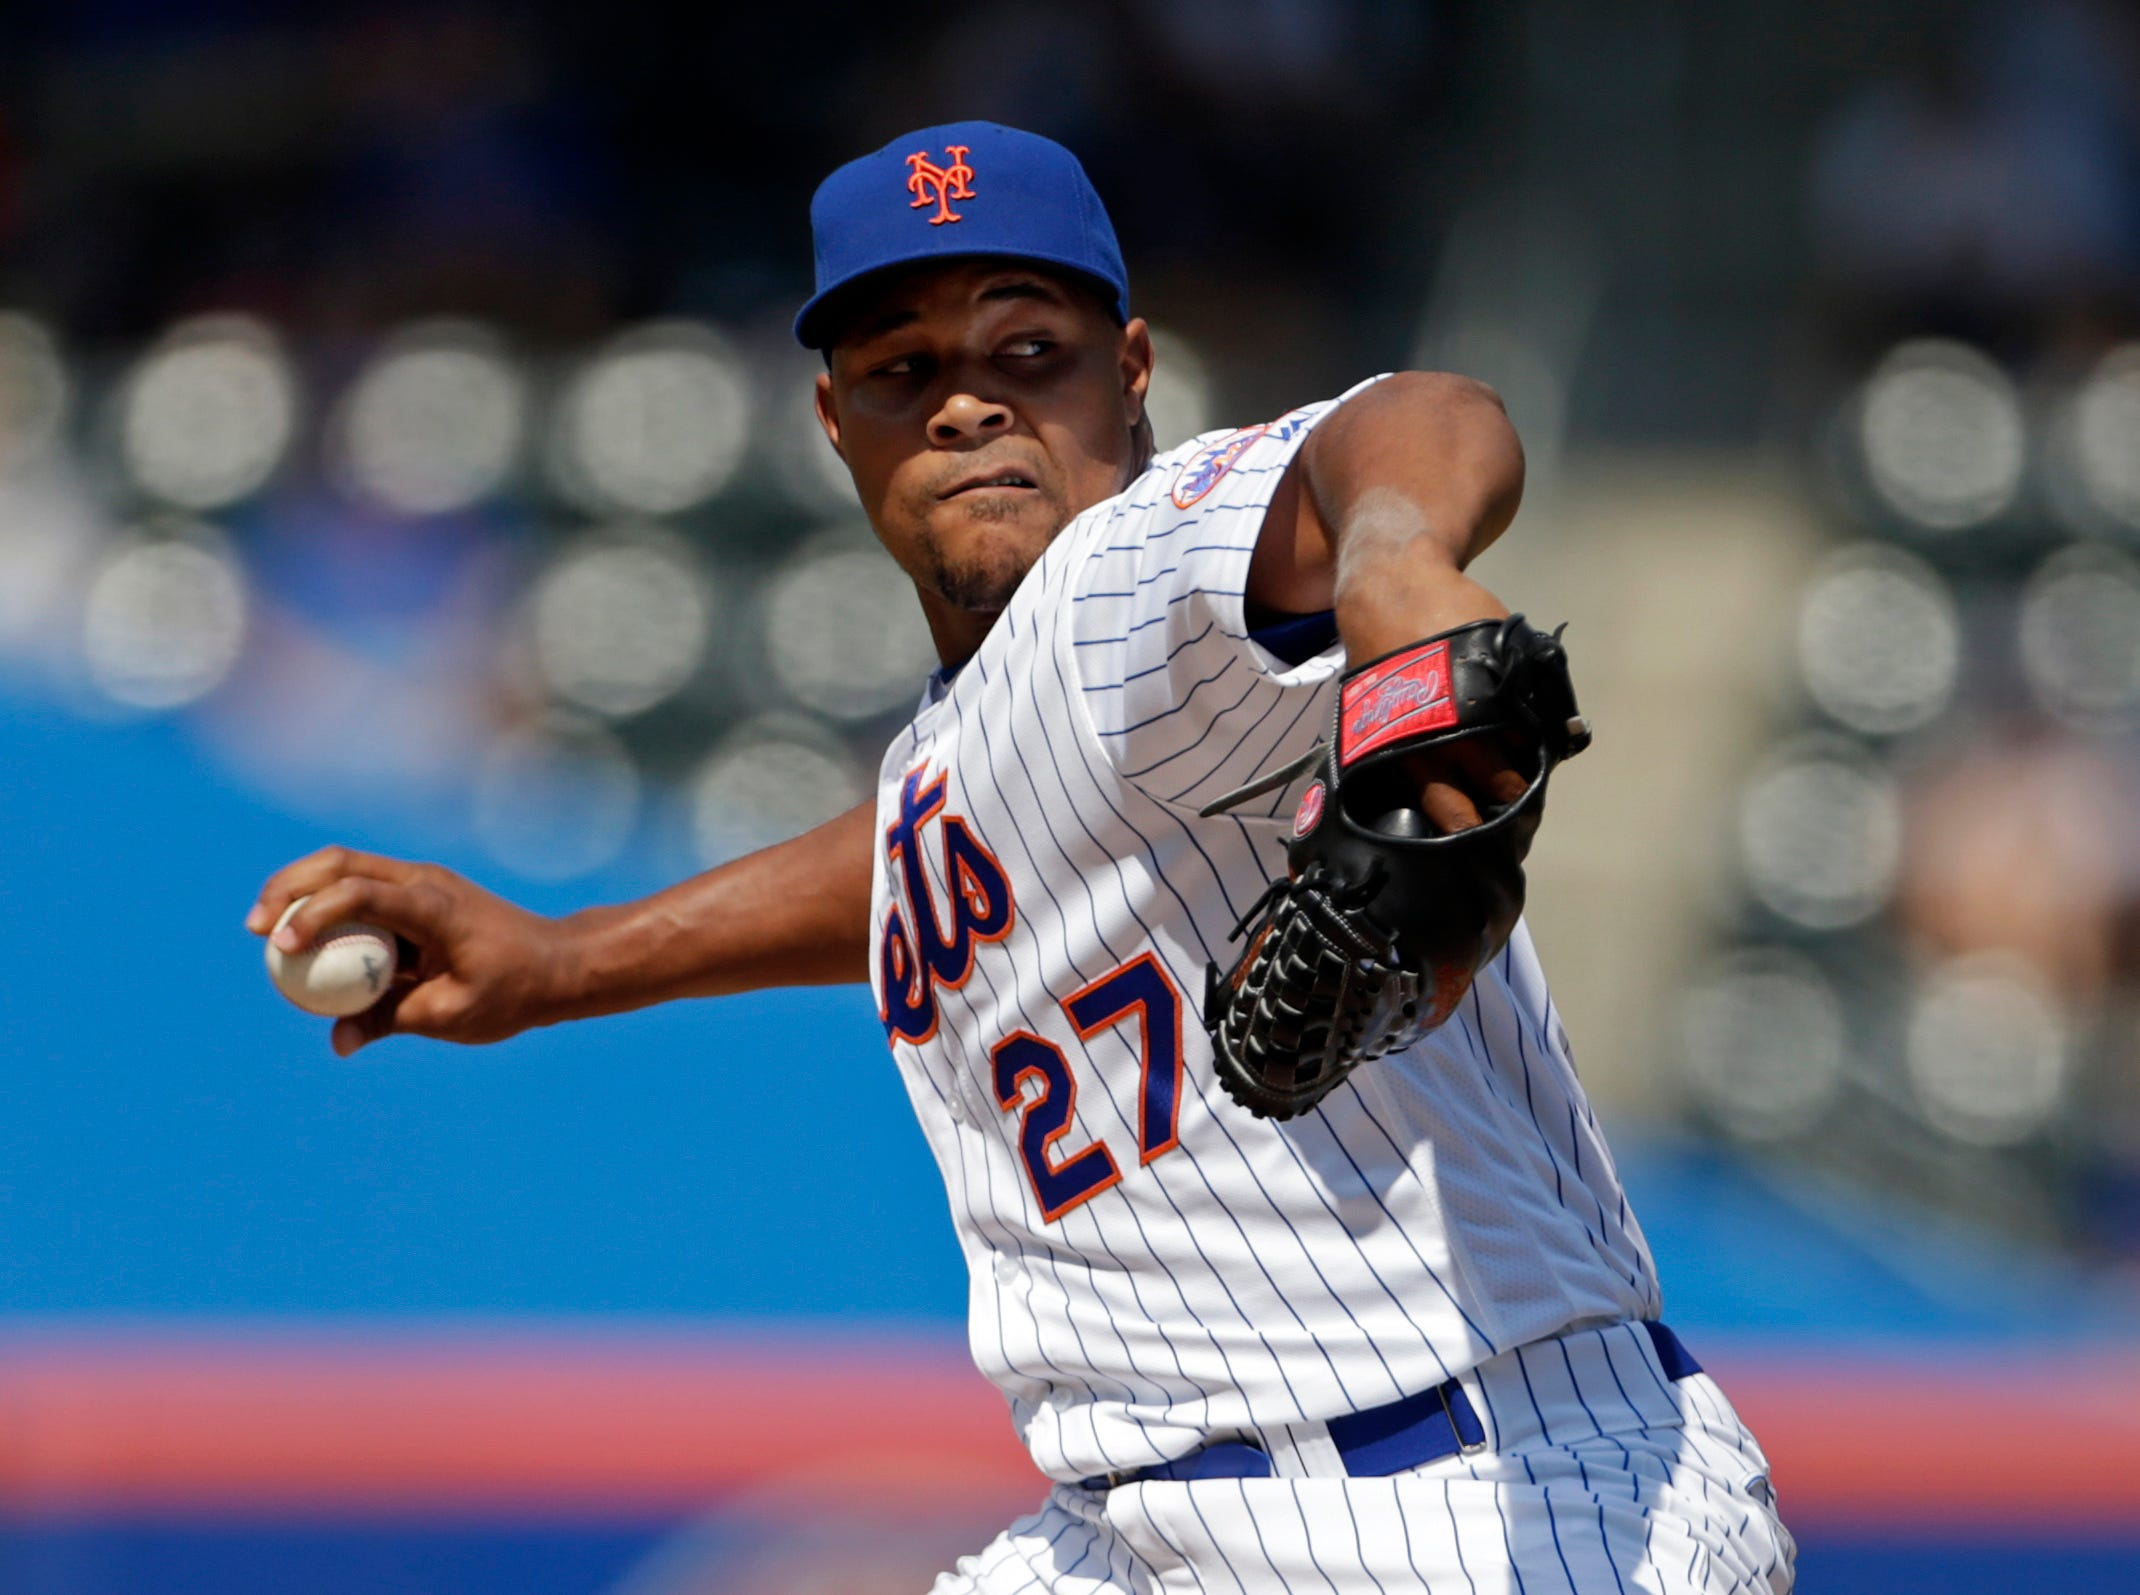 51 – Jeurys Familia, Mets, 2016